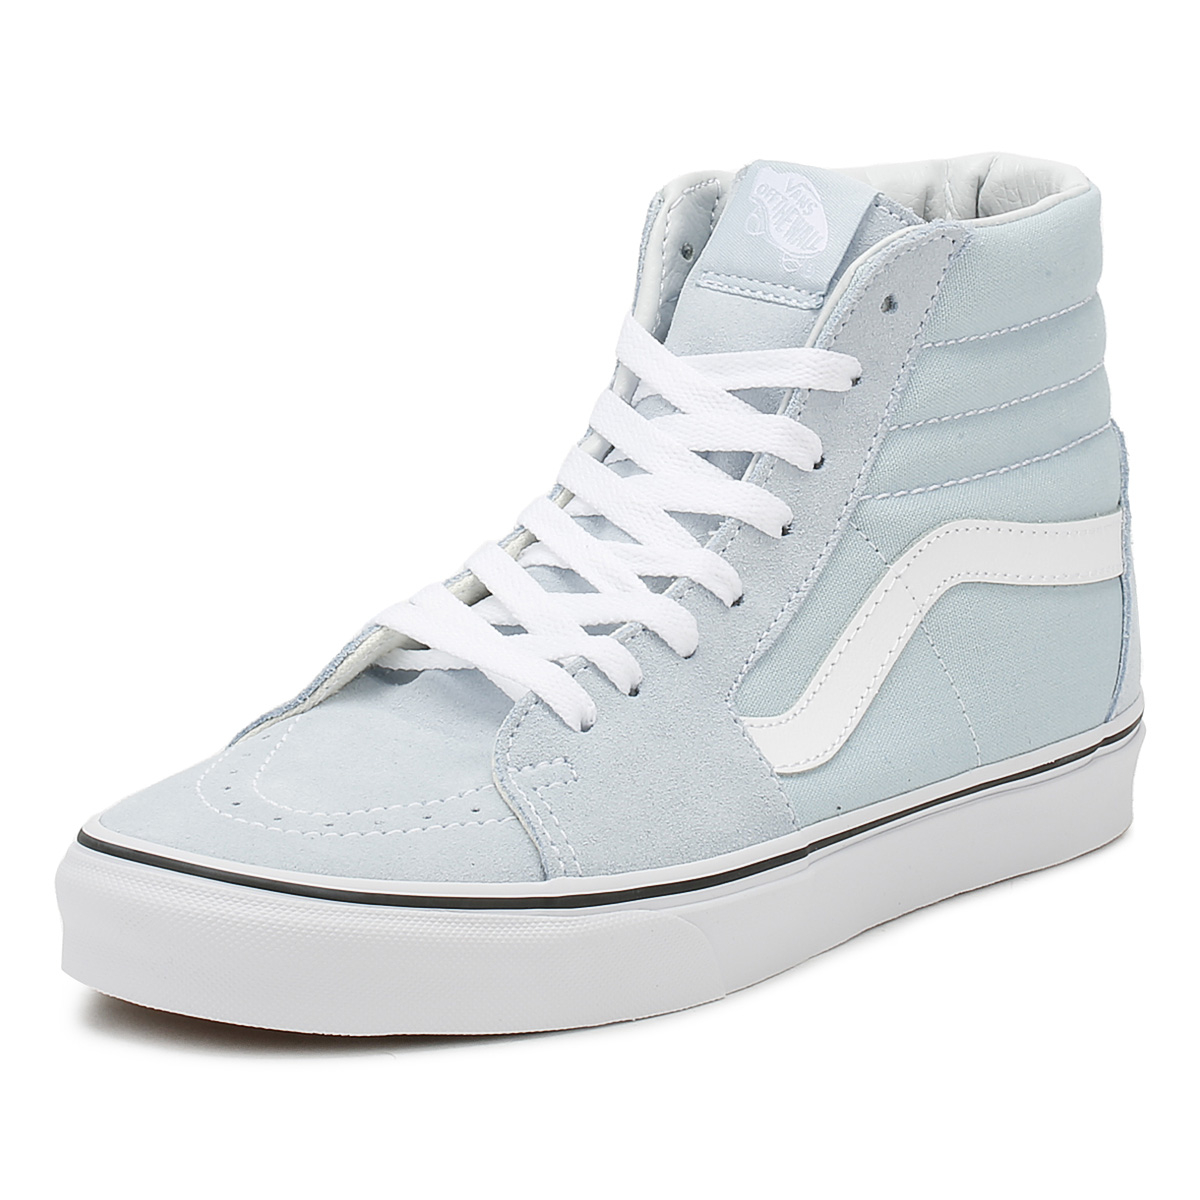 f01ec8c5d3 Details about Vans Womens Baby Blue   True White SK8-Hi Trainers Lace Up  Sport Casual Shoes